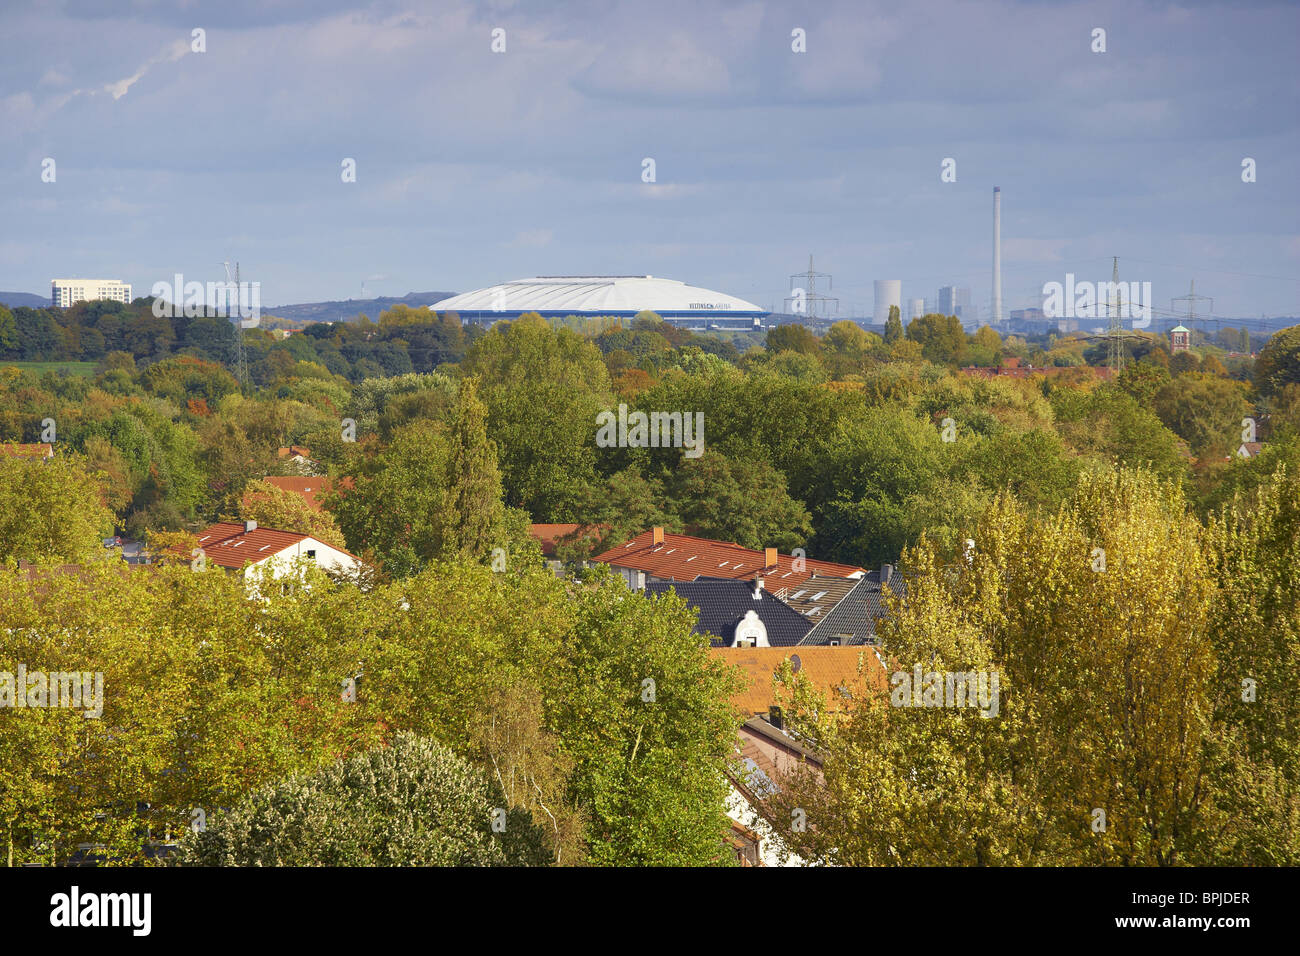 View at Veltins Arena at Gelsenkirchen, Ruhrgebiet, North Rhine-Westphalia, Germany, Europe - Stock Image